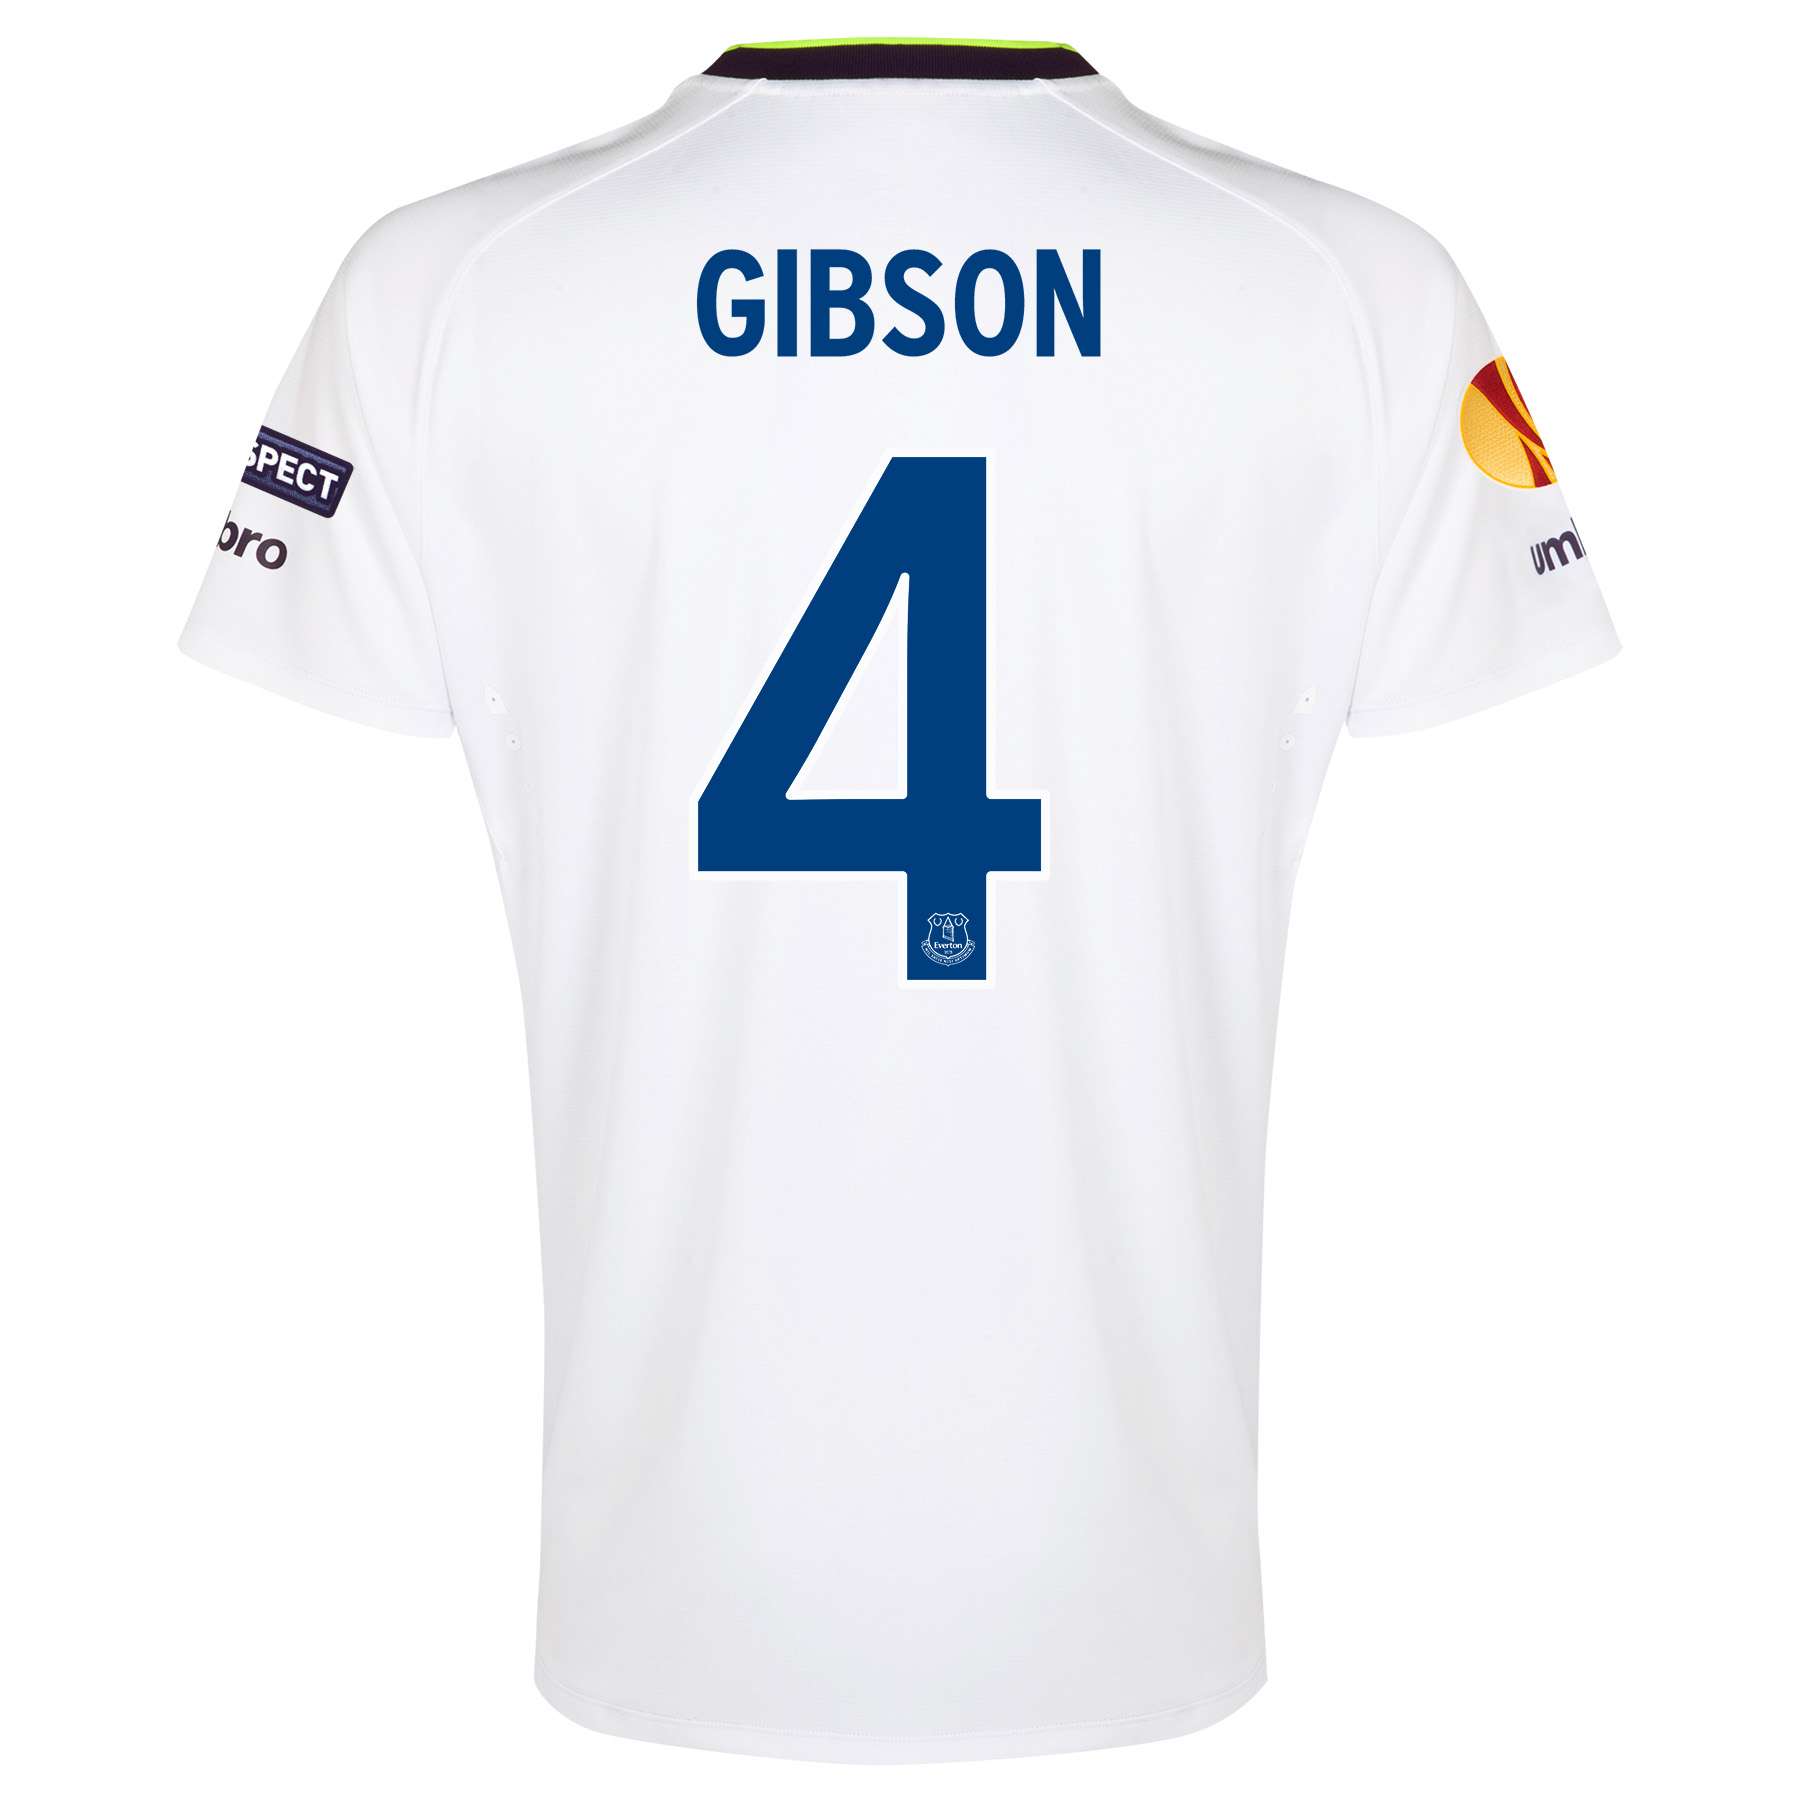 Everton UEFA Europa League 3rd Shirt 2014/15 with Gibson 4 printing